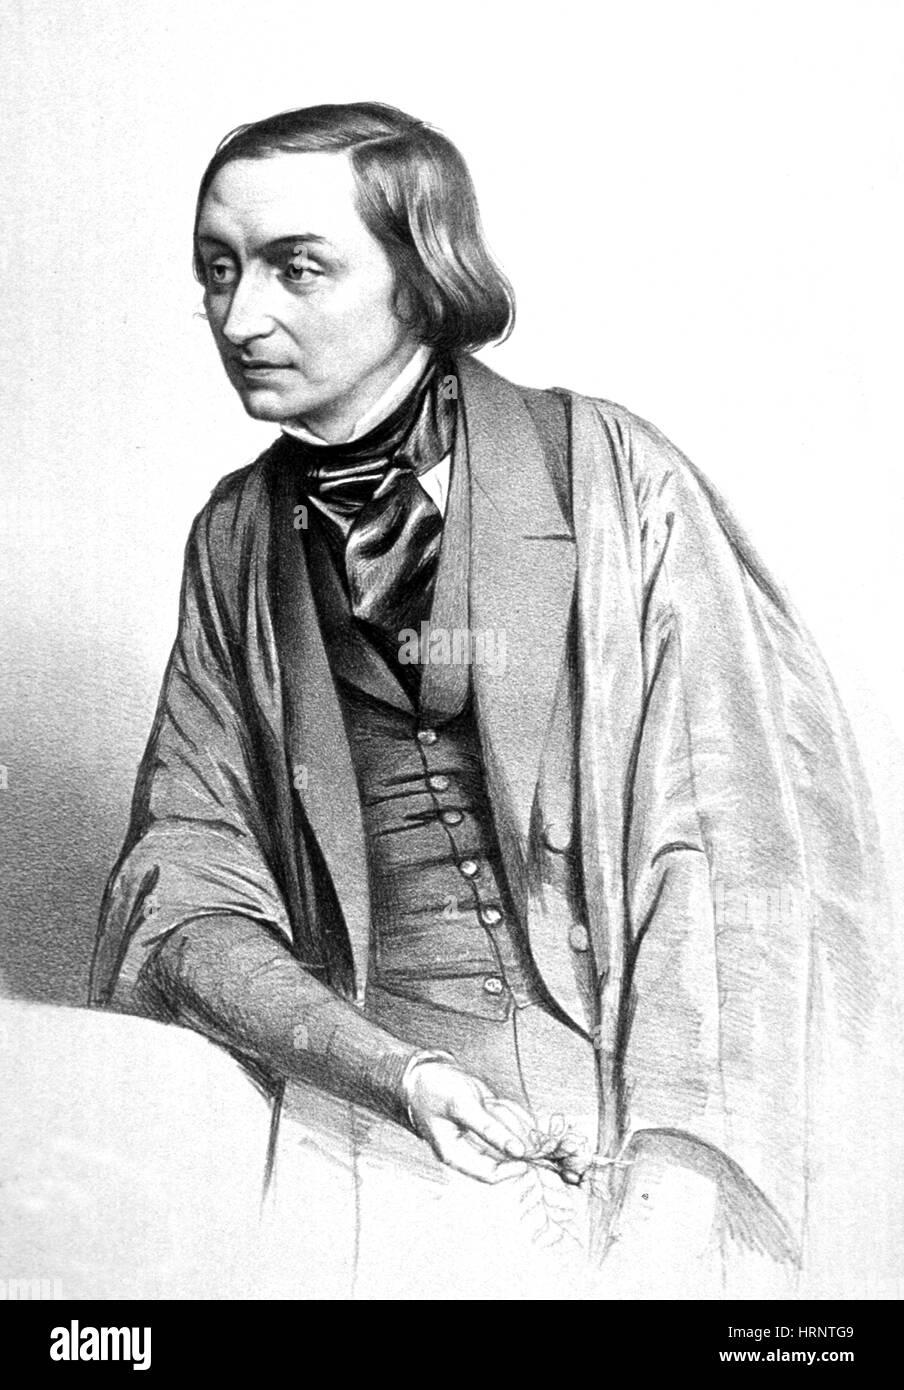 Edward Forbes, Manx Naturalist - Stock Image